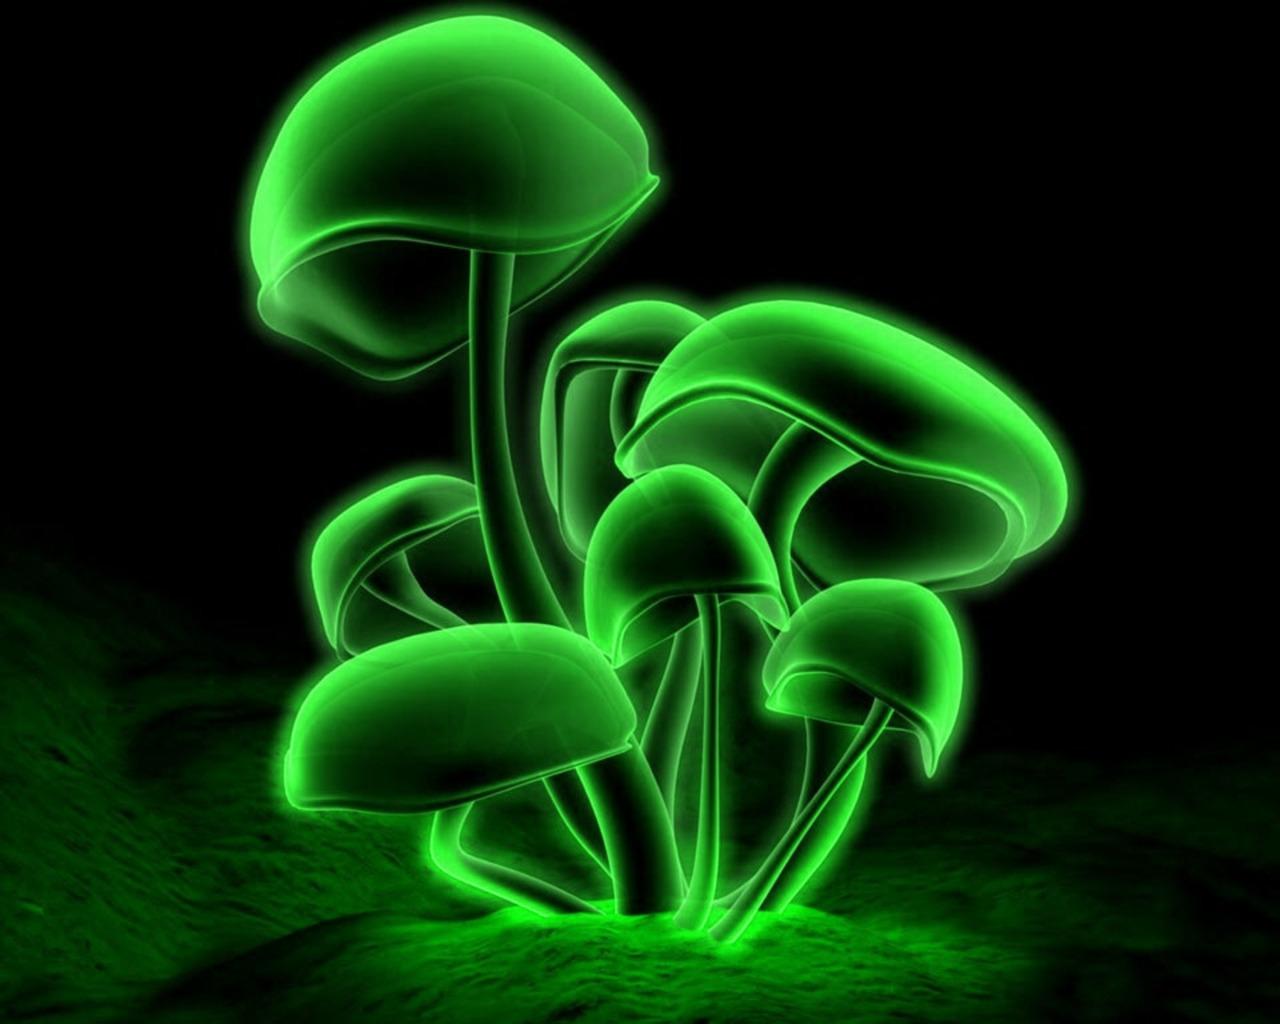 http://4.bp.blogspot.com/-q6CeklEKVbk/TqBHL1KKLvI/AAAAAAAAAE0/YDk0cIj_-Lo/s1600/green-mushroom-wallpaper-tab.jpg